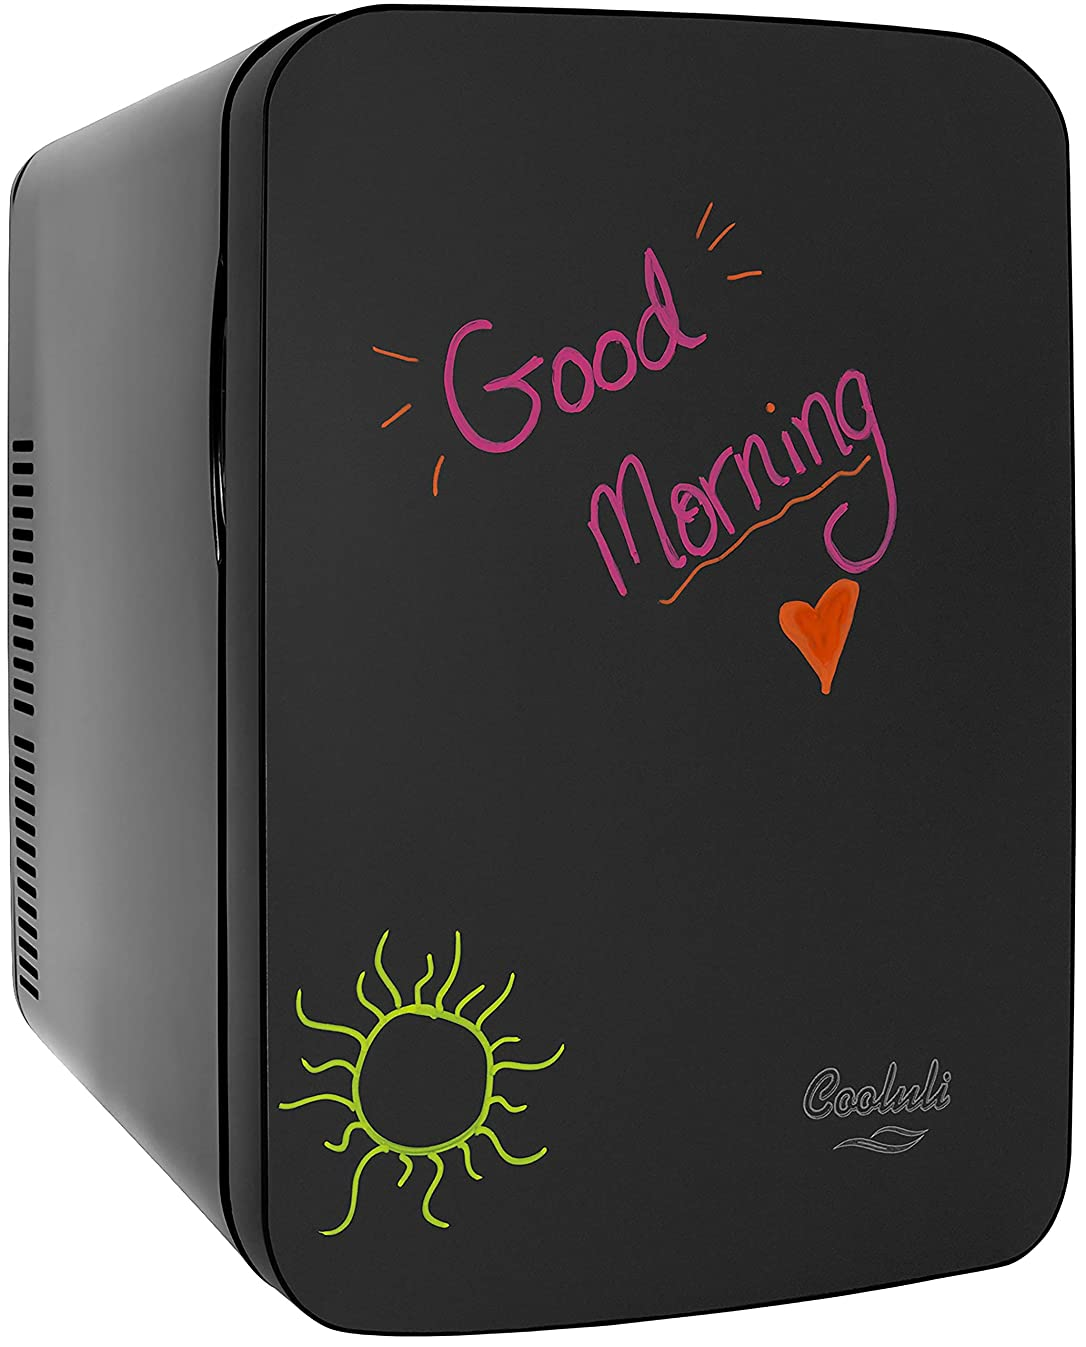 Cooluli Vibe-15-liter Cooler/Warmer Blackboard Mini Fridge for Dorms, Offices, Homes & Cars